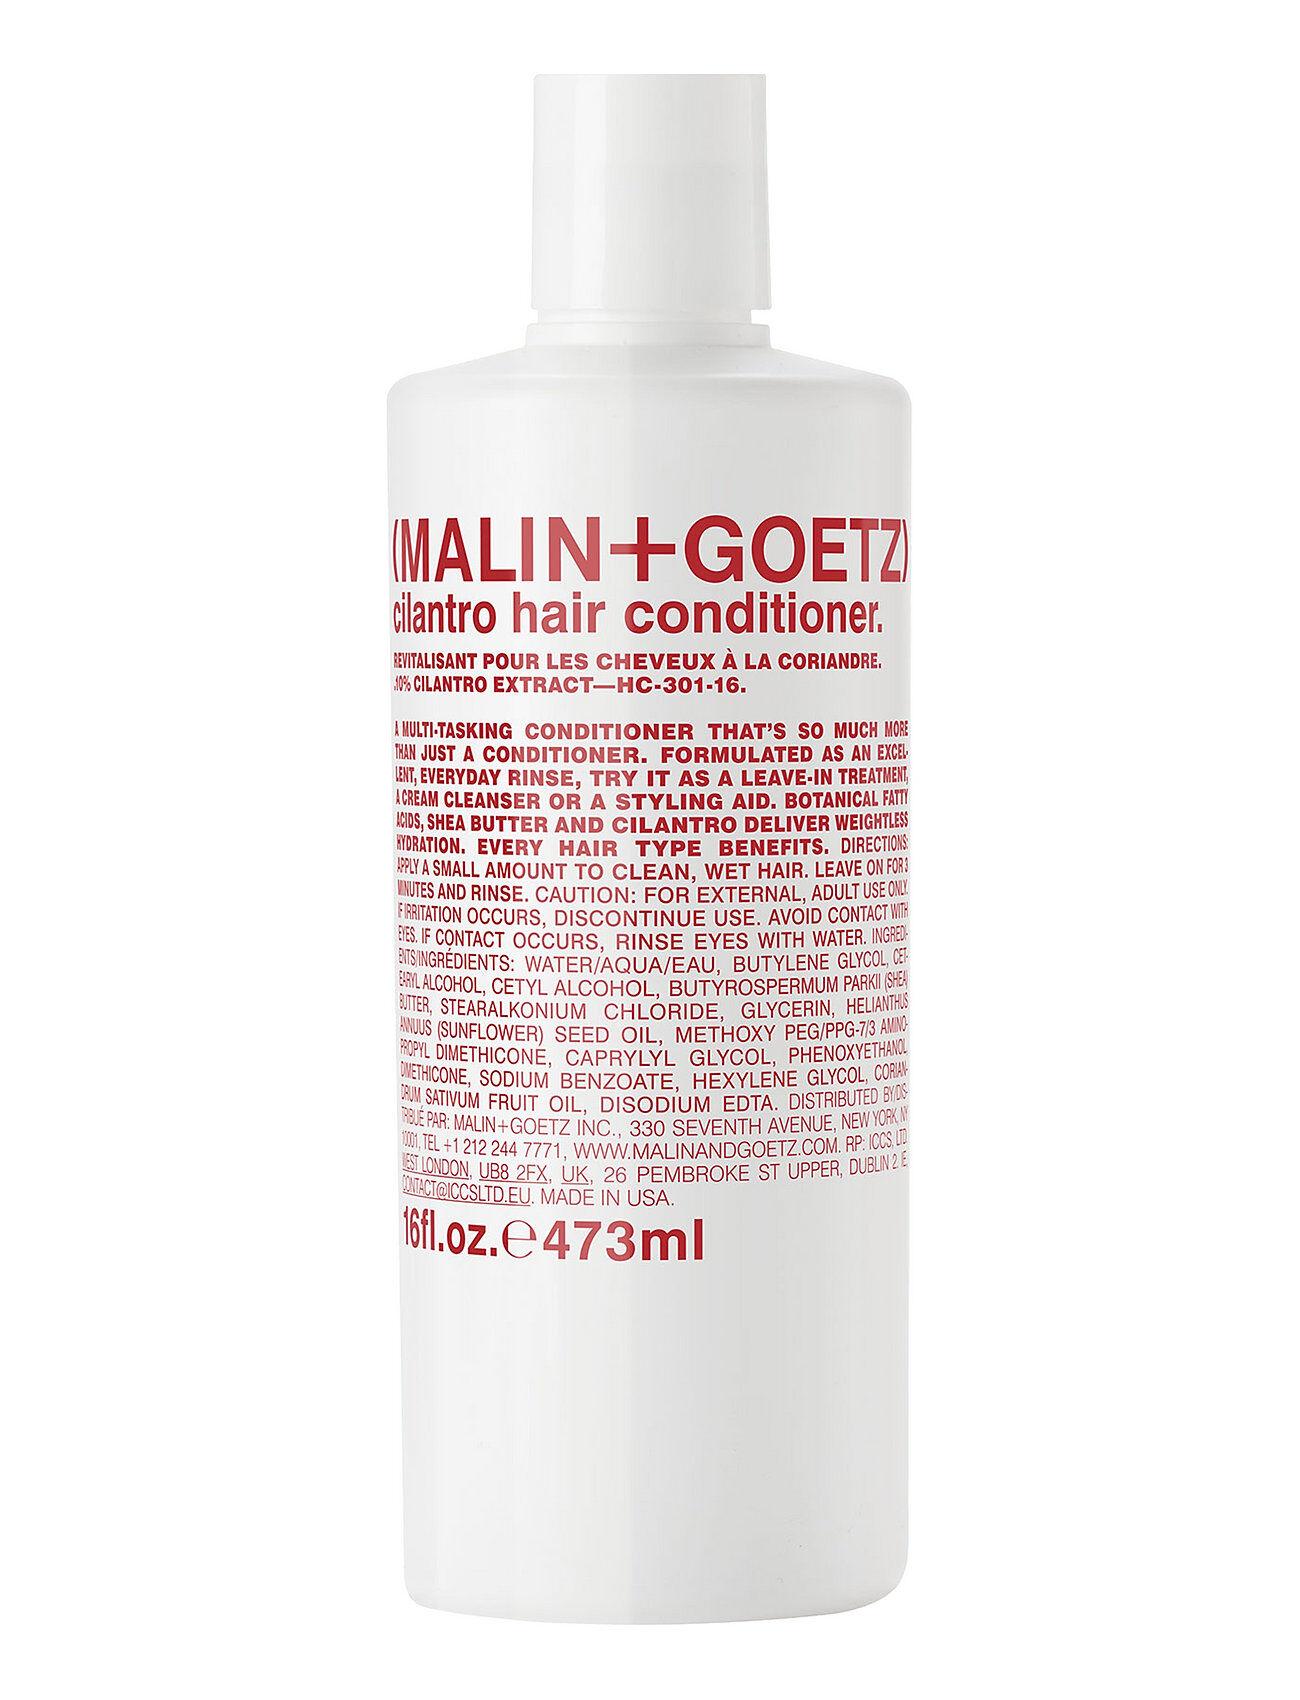 MALIN+GOETZ Cilantro Hair Conditi R Hoitoaine Hiustenhoito Nude MALIN+GOETZ